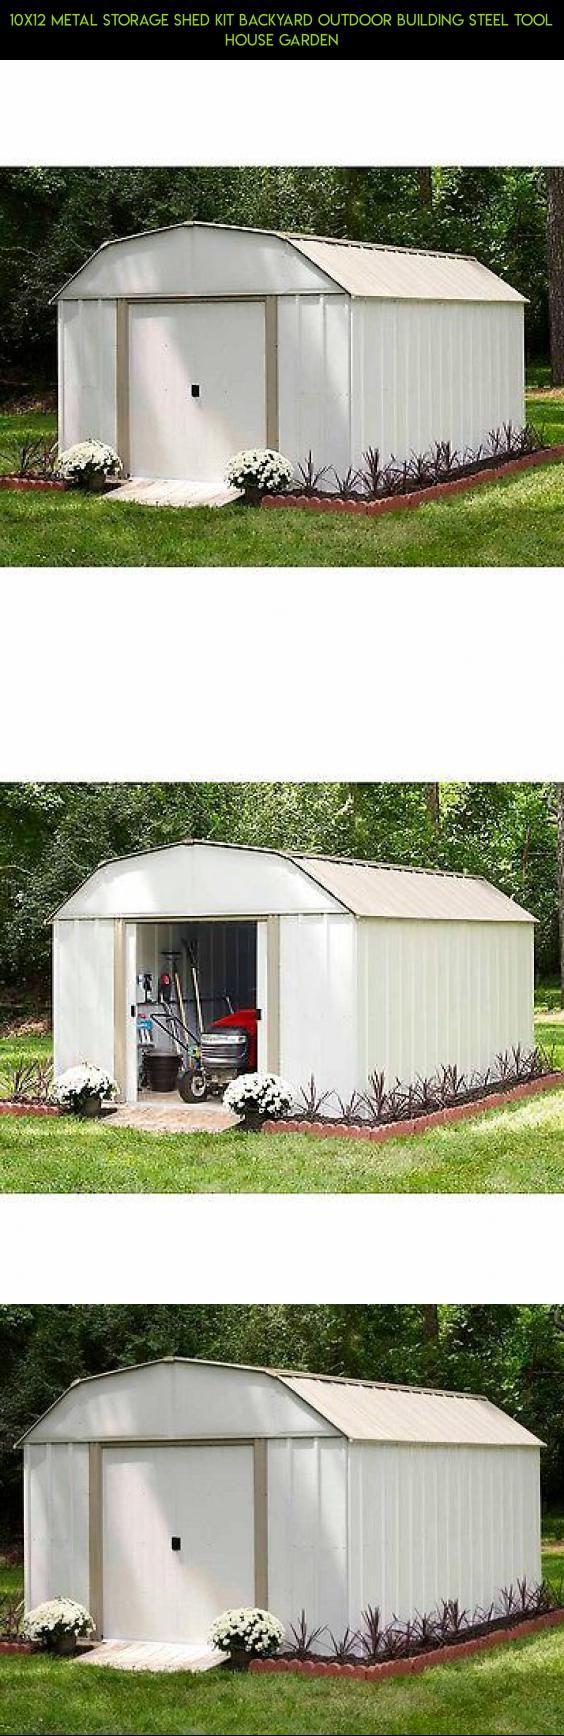 10x12 metal storage shed kit backyard outdoor building steel tool